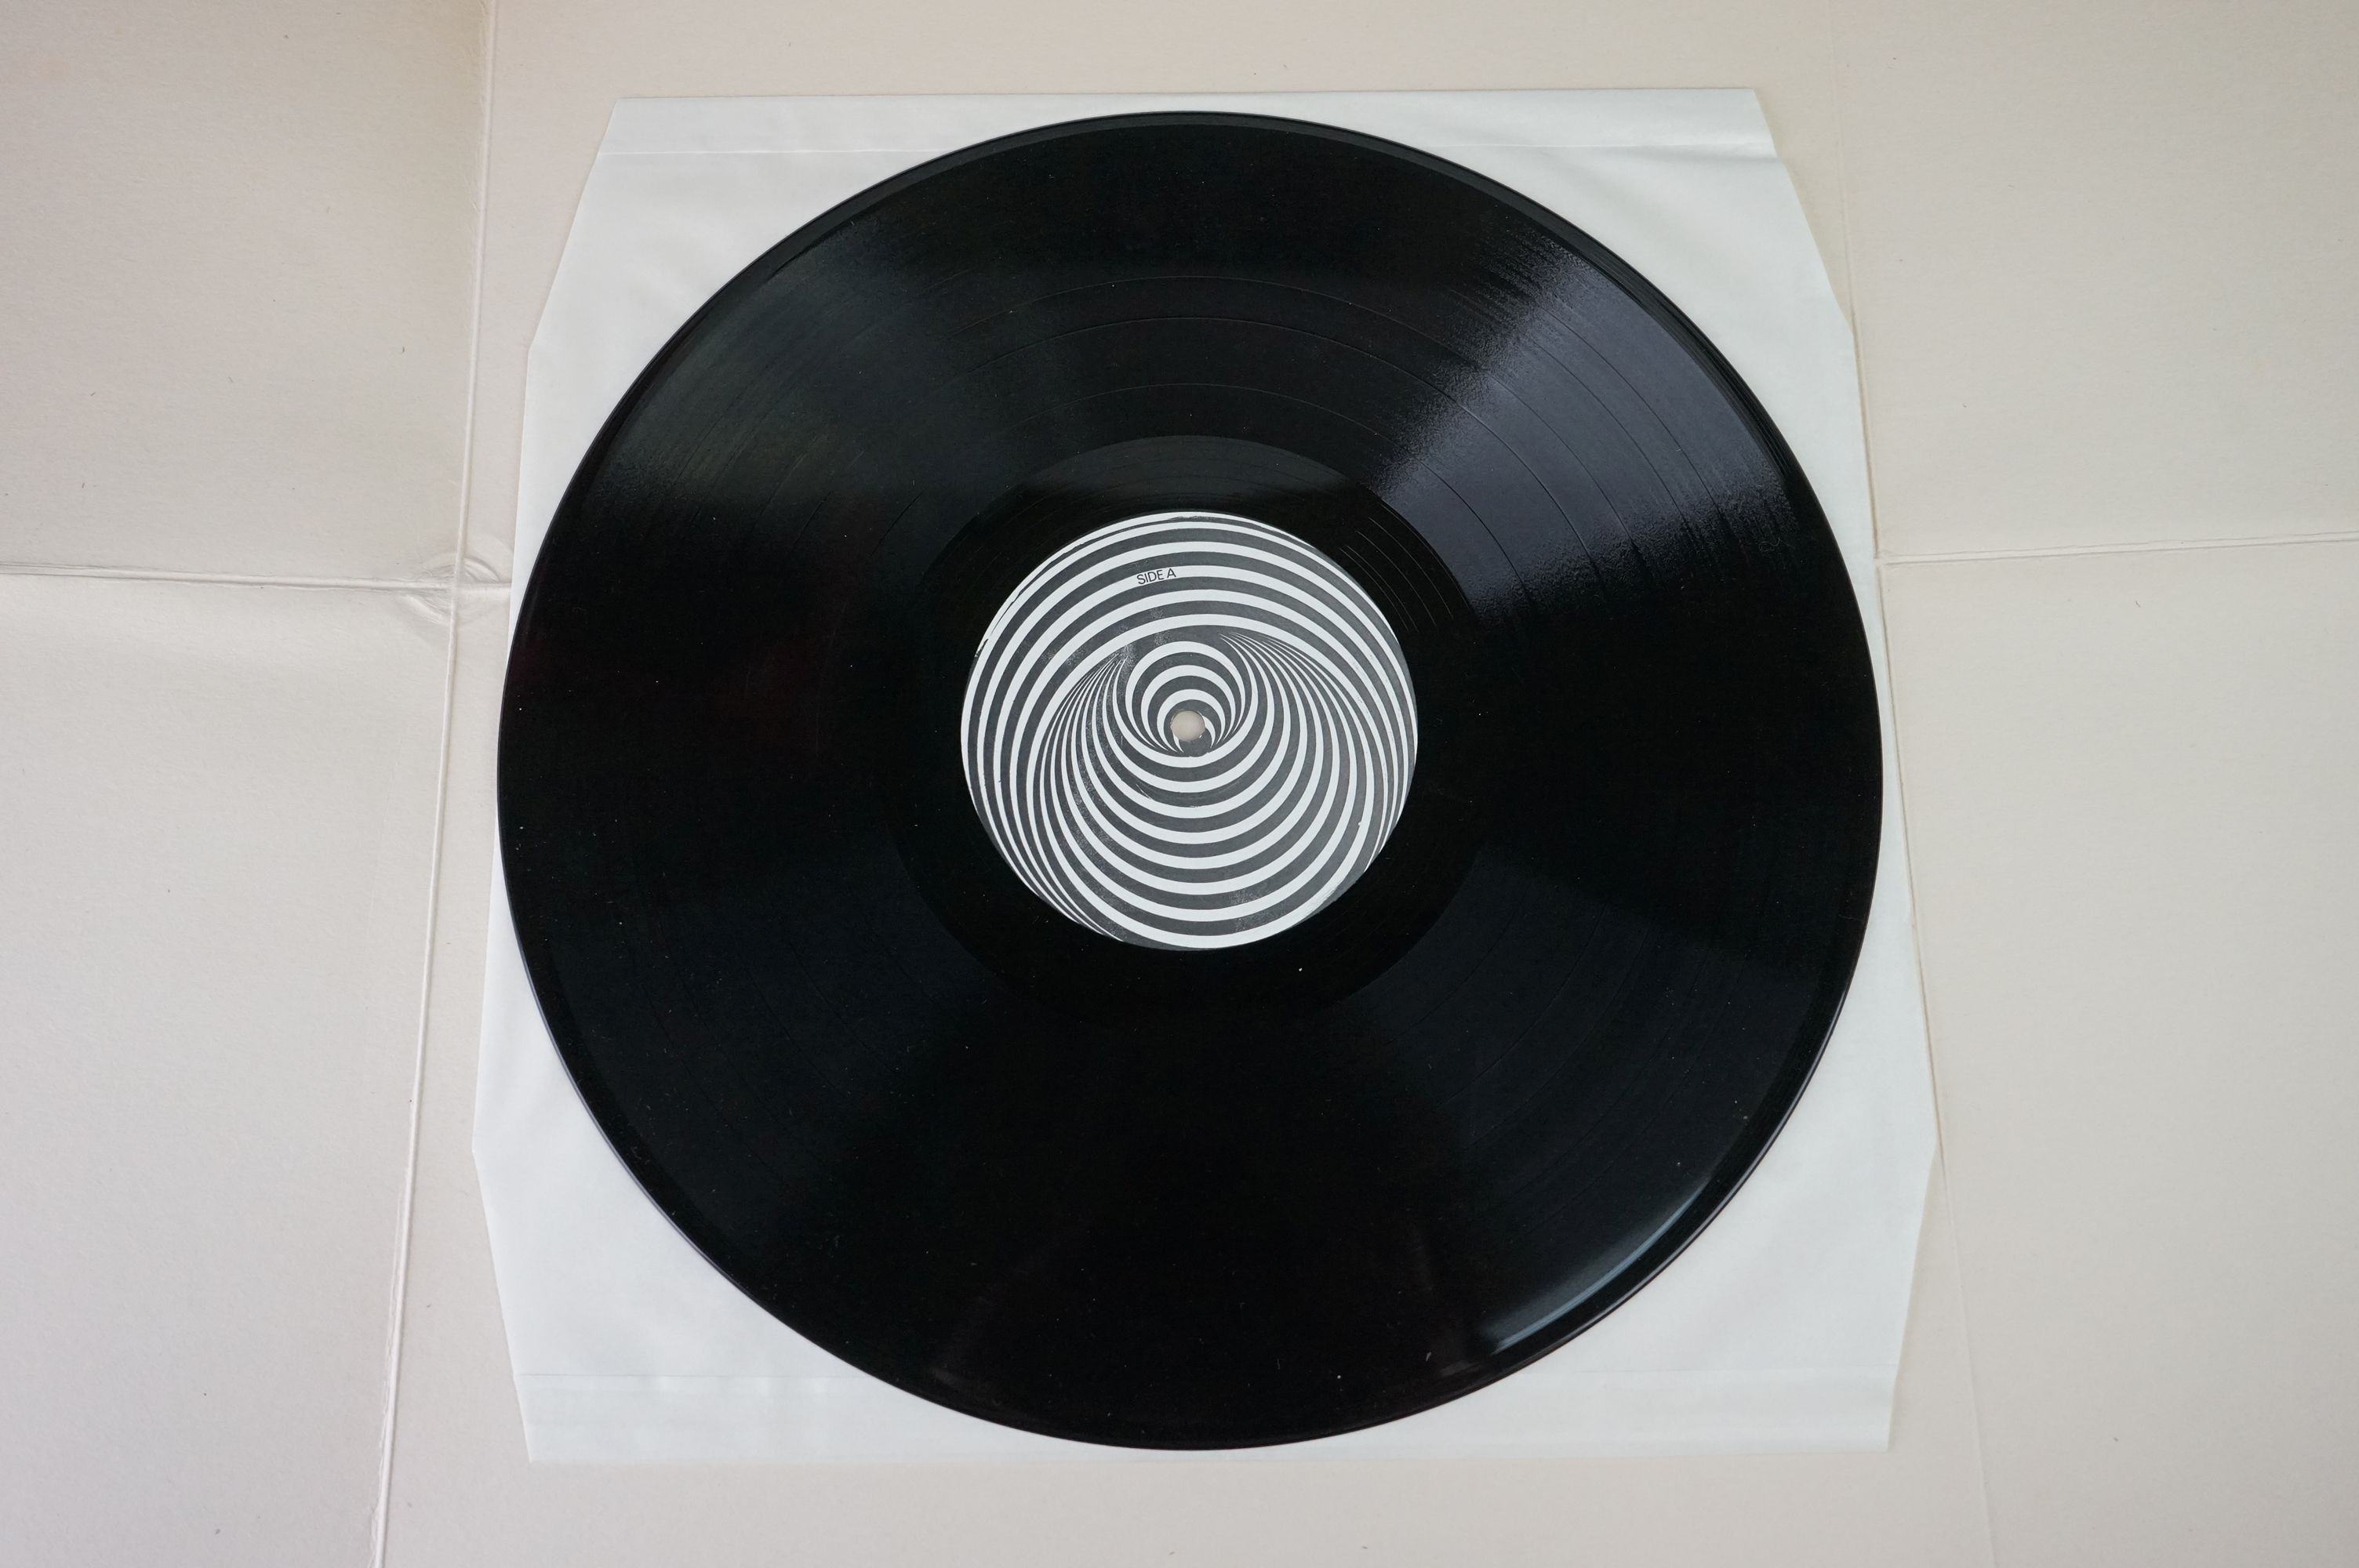 Vinyl - Tudor Lodge self titled LP on Vertigo 6360043 Unofficial release, not play tested - Image 4 of 7